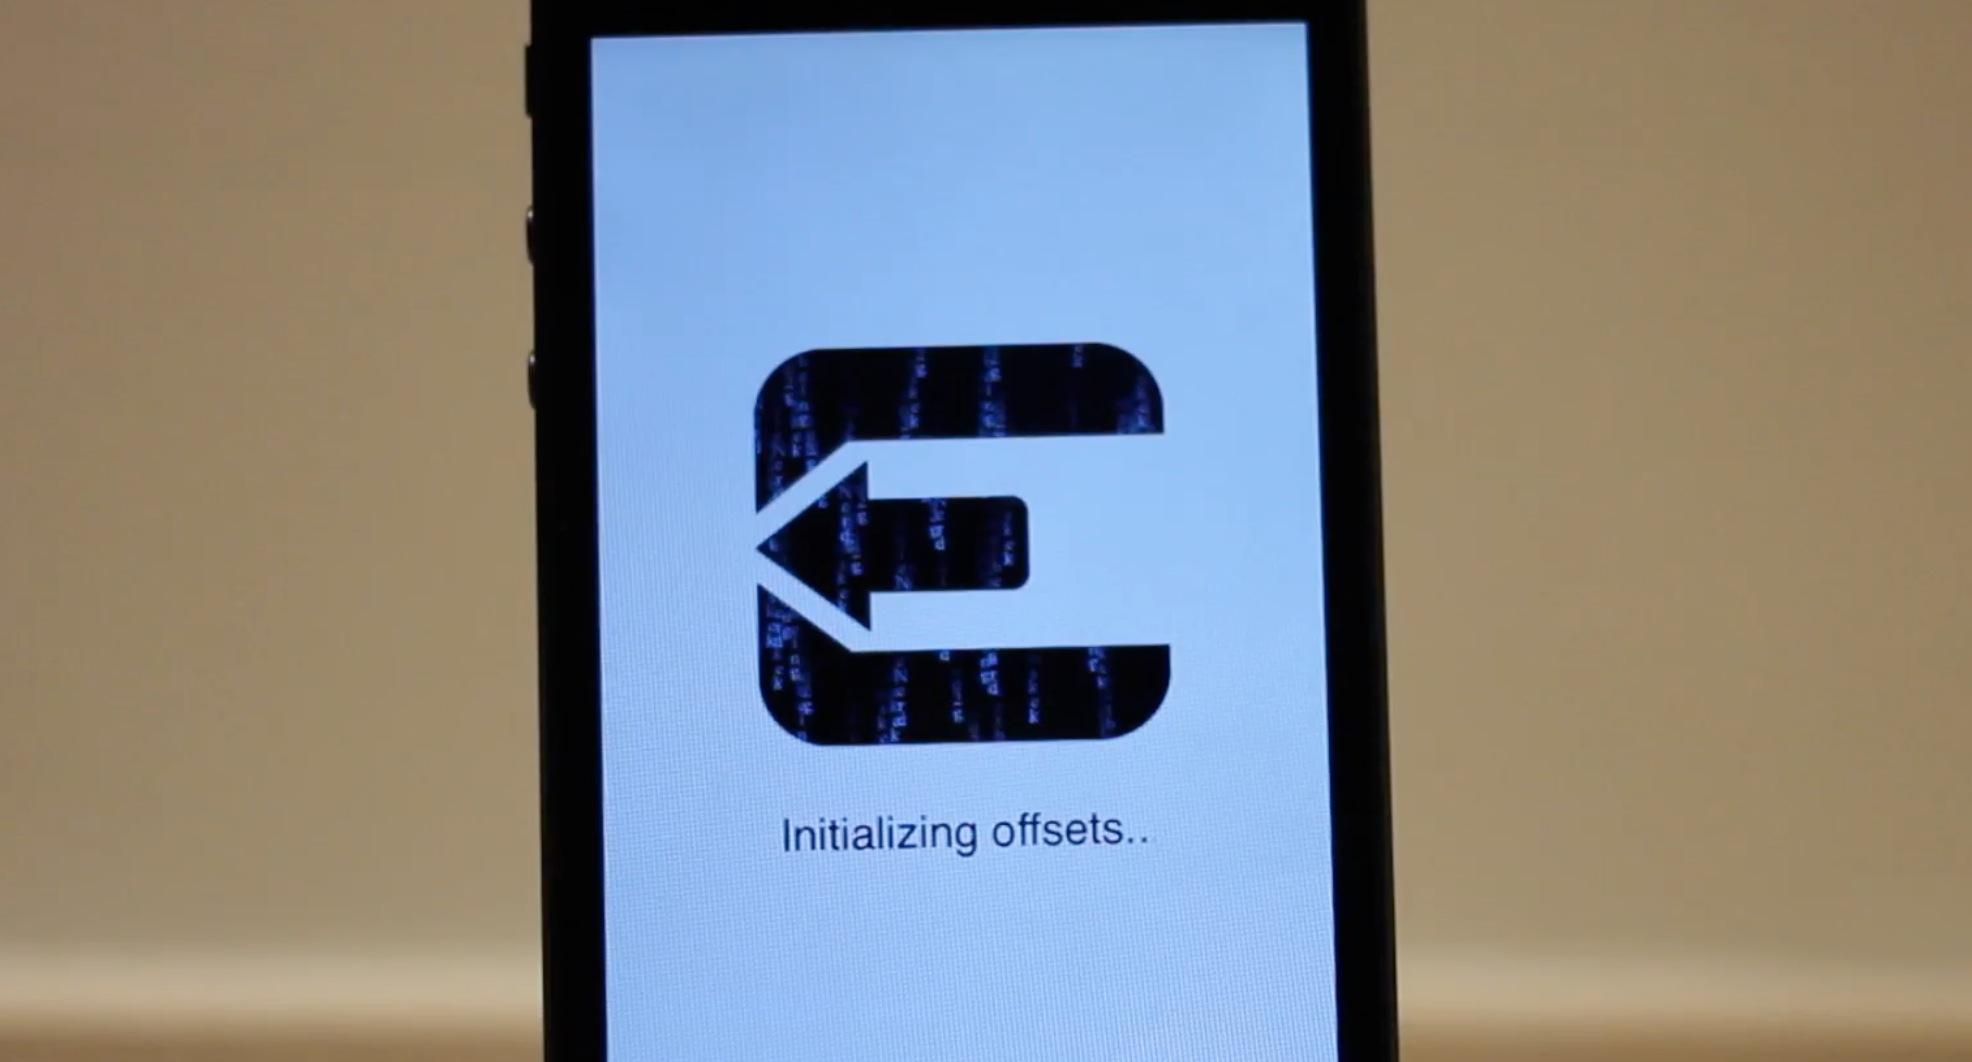 evasi0n initializing offsets